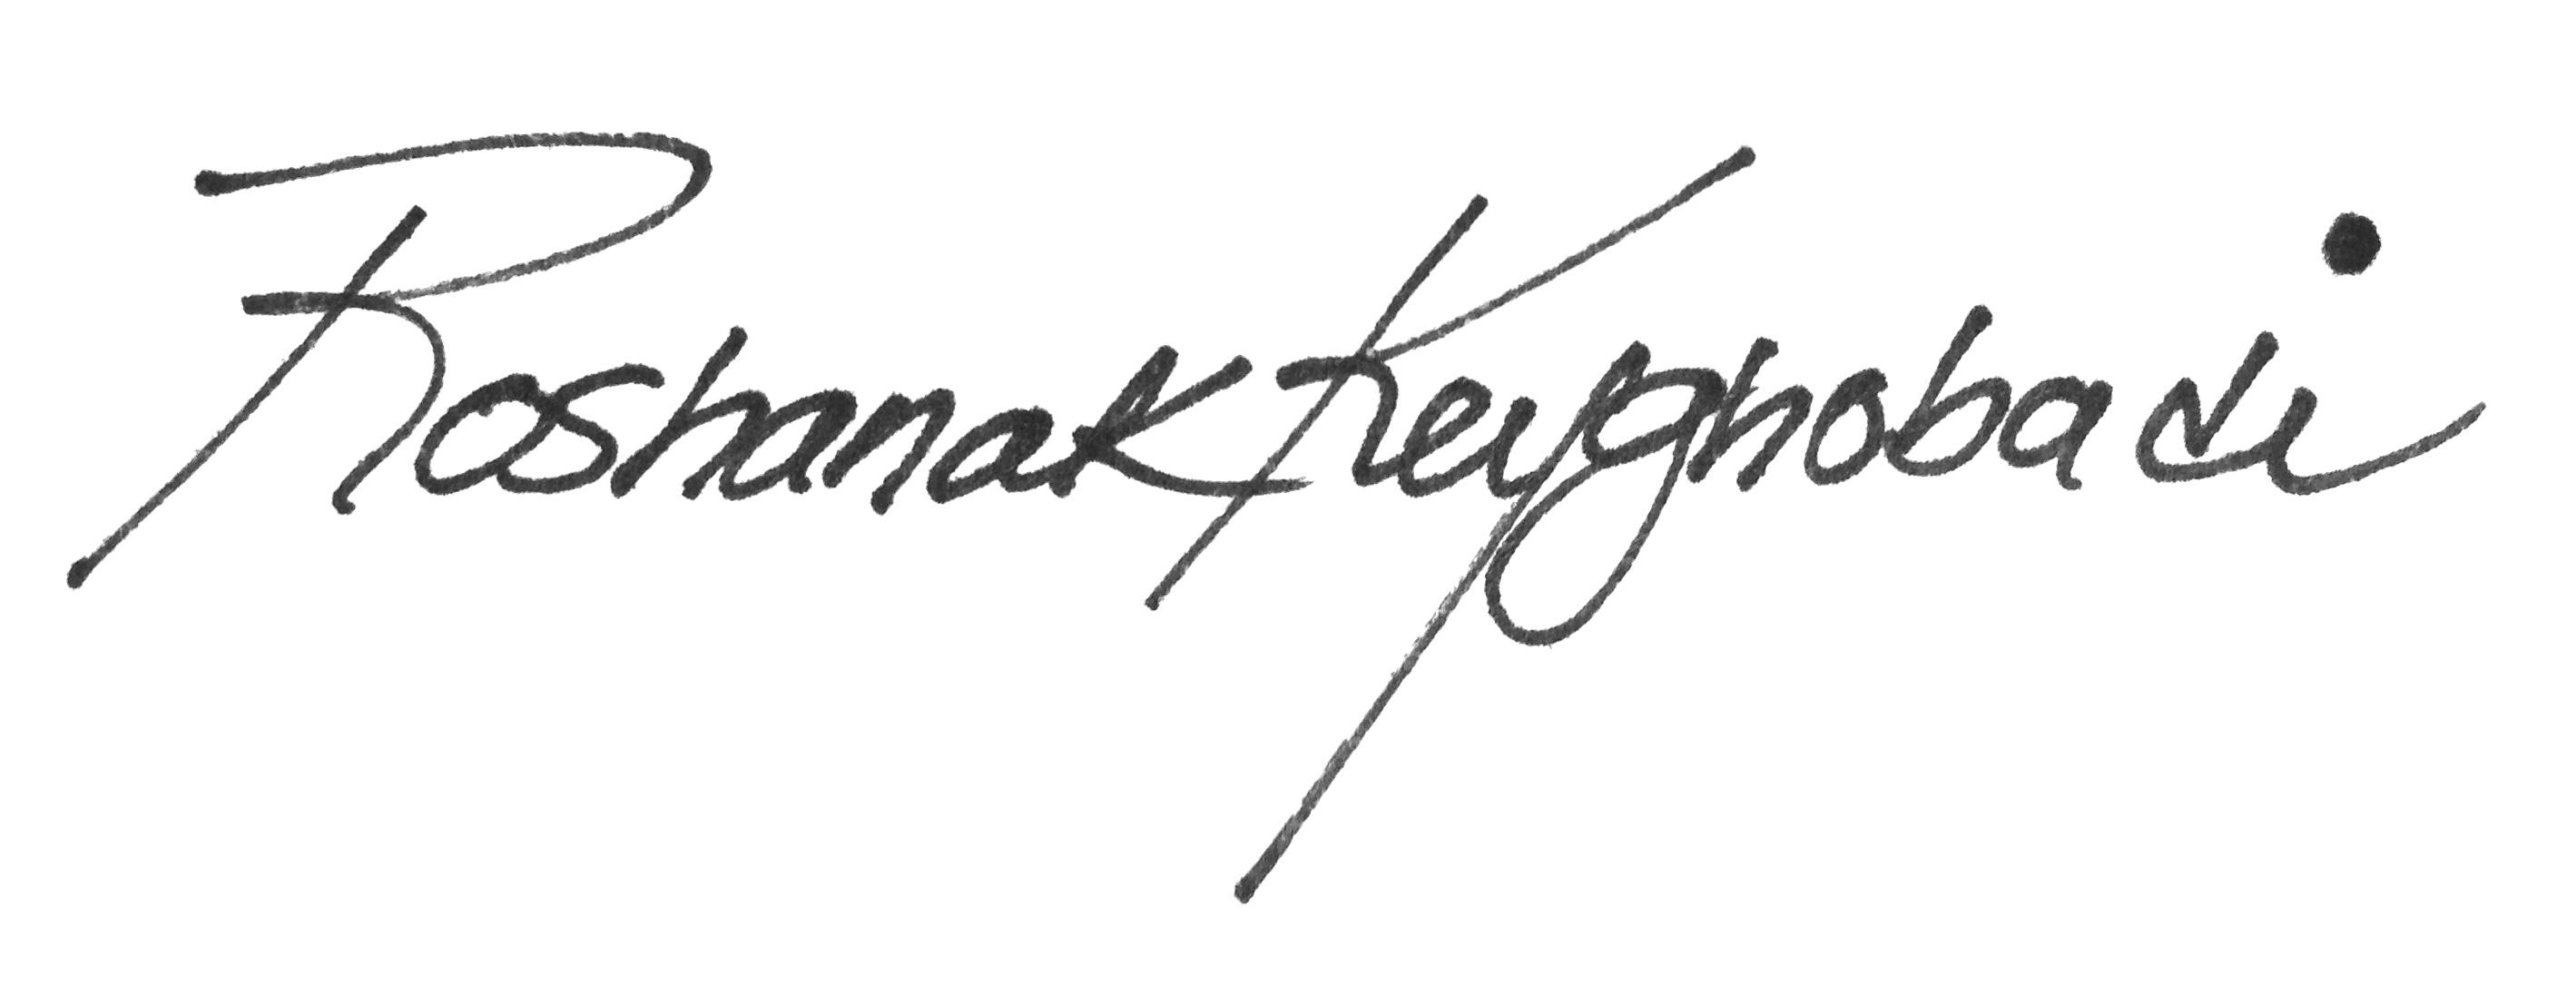 Roshanak Keyghobadi Signature